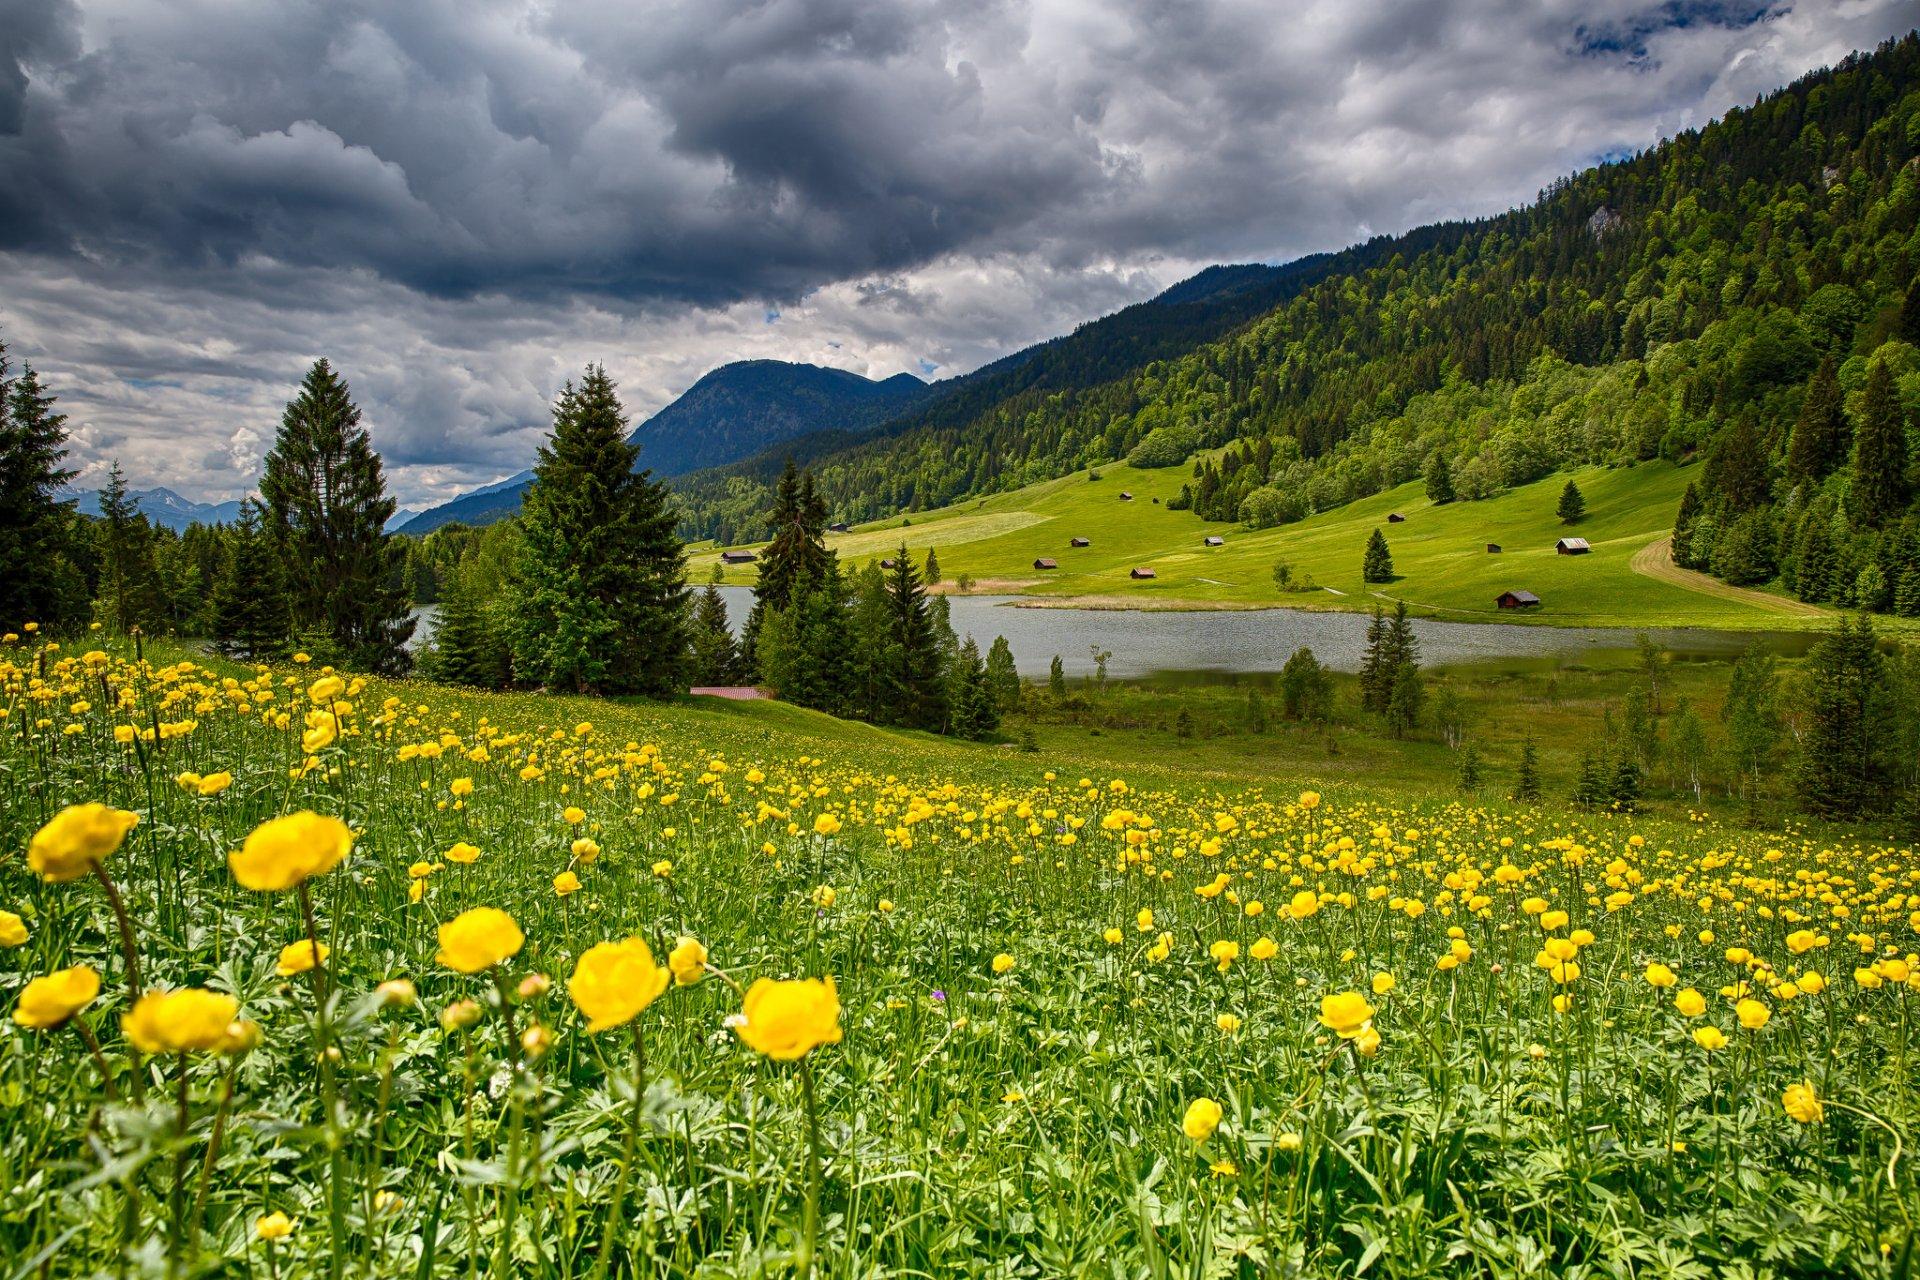 Облака, трава, цветы, озеро  № 1963104 бесплатно